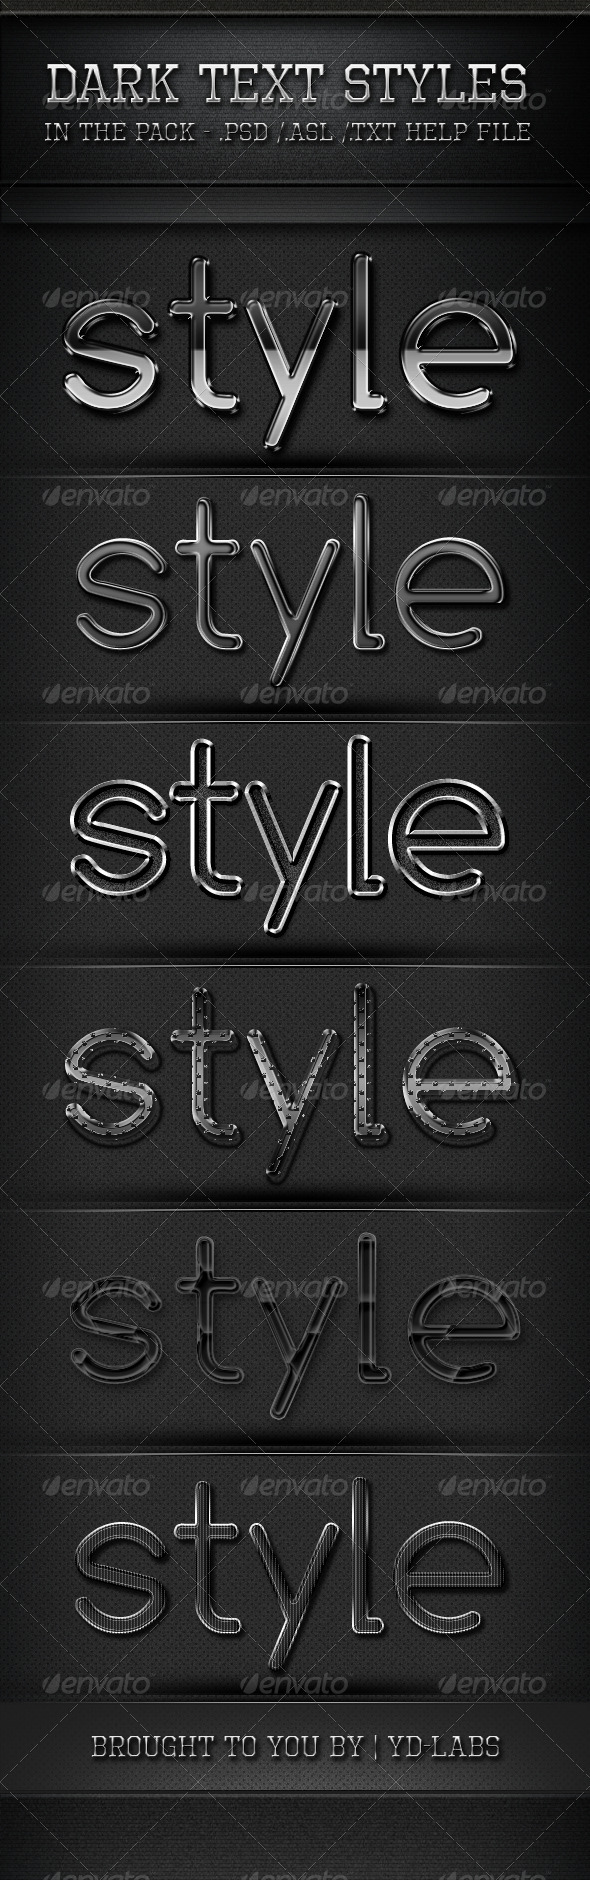 GraphicRiver Dark Text Styles 760016